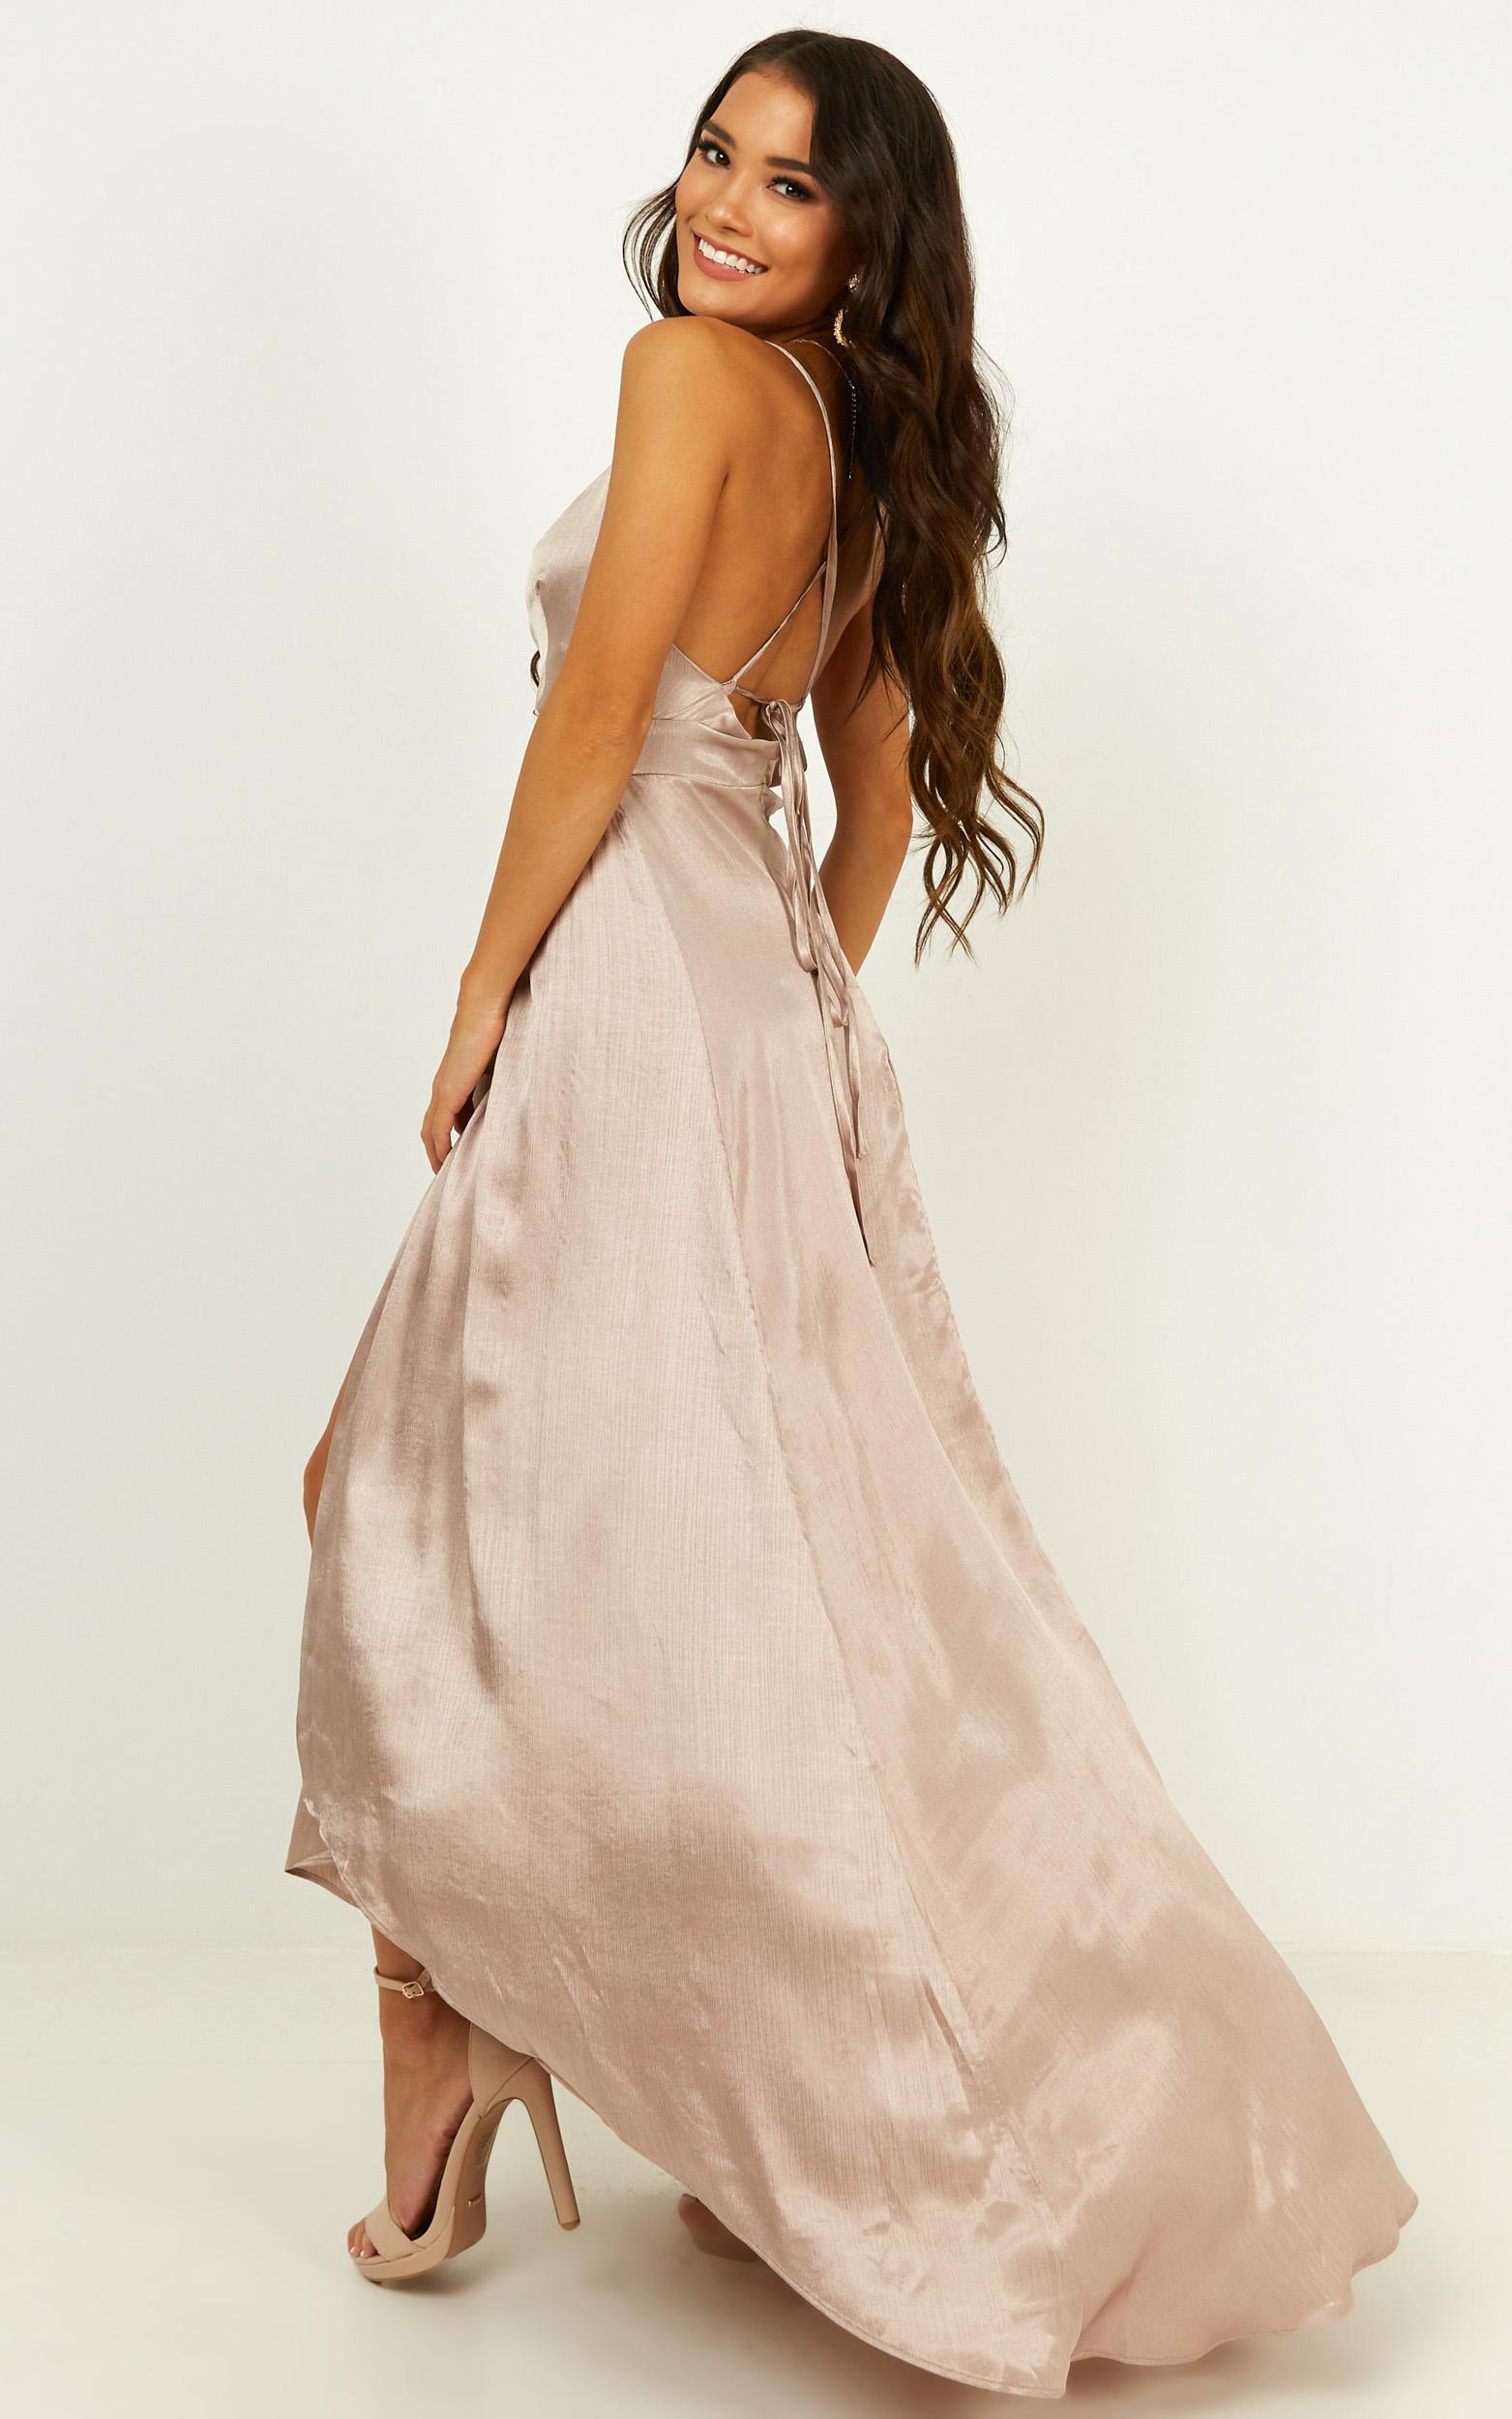 No mistaking dress in mocha satin - 20 (XXXXL), Mocha, hi-res image number null